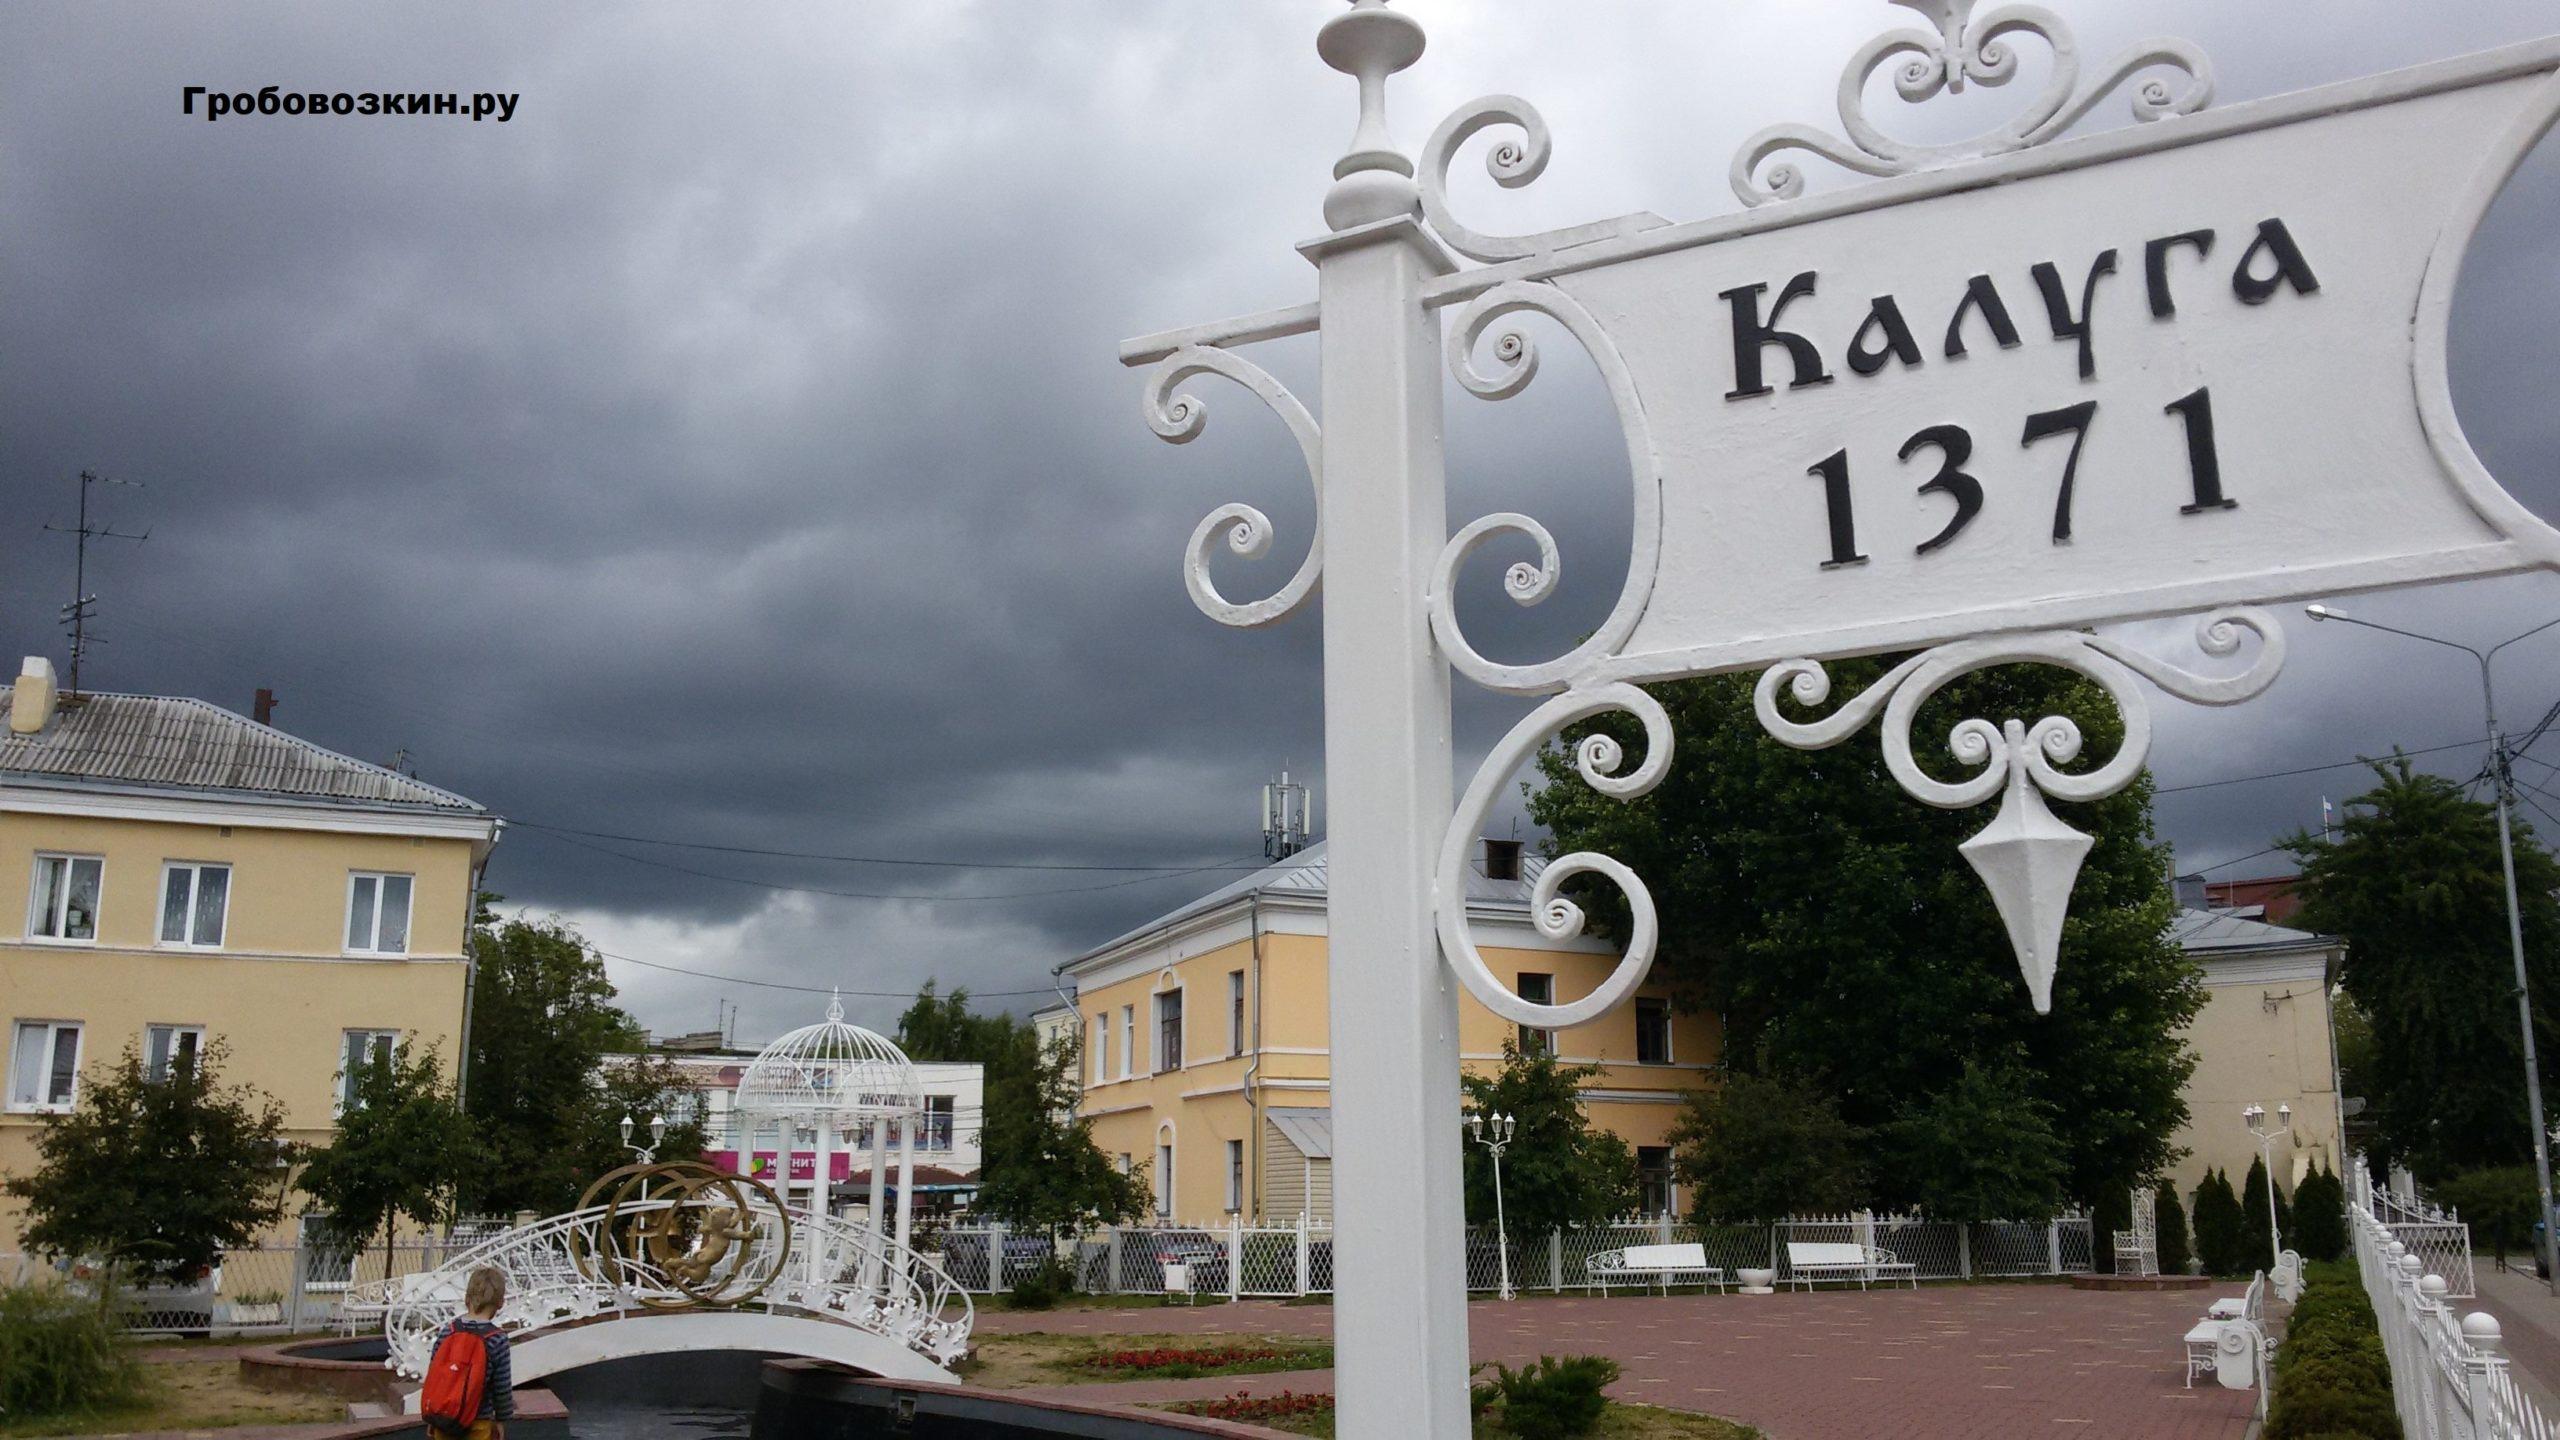 Перевозка умершего, умершей, гроба, груза 200 Москва Калуга.